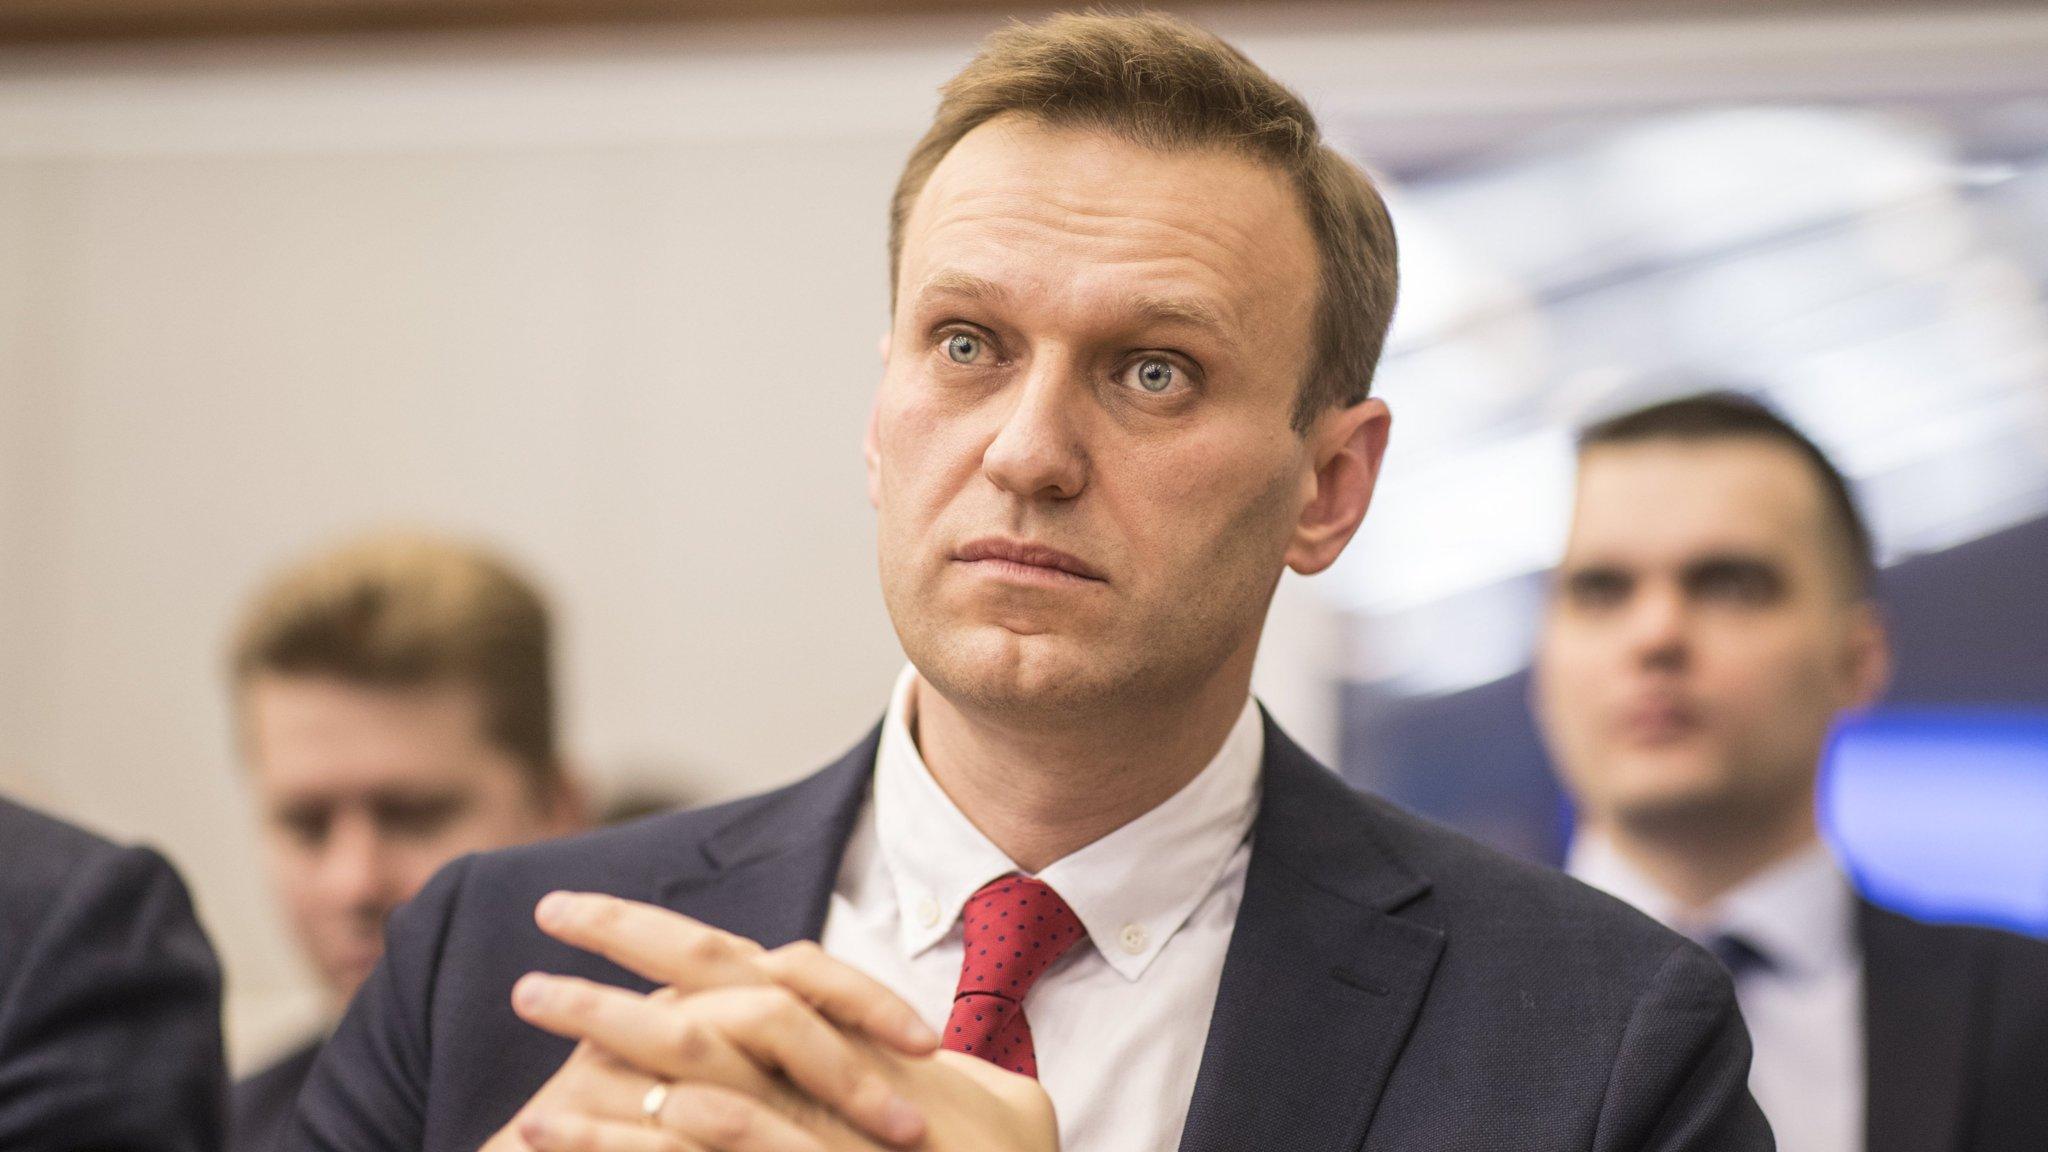 Russia bars Navalny from running for president